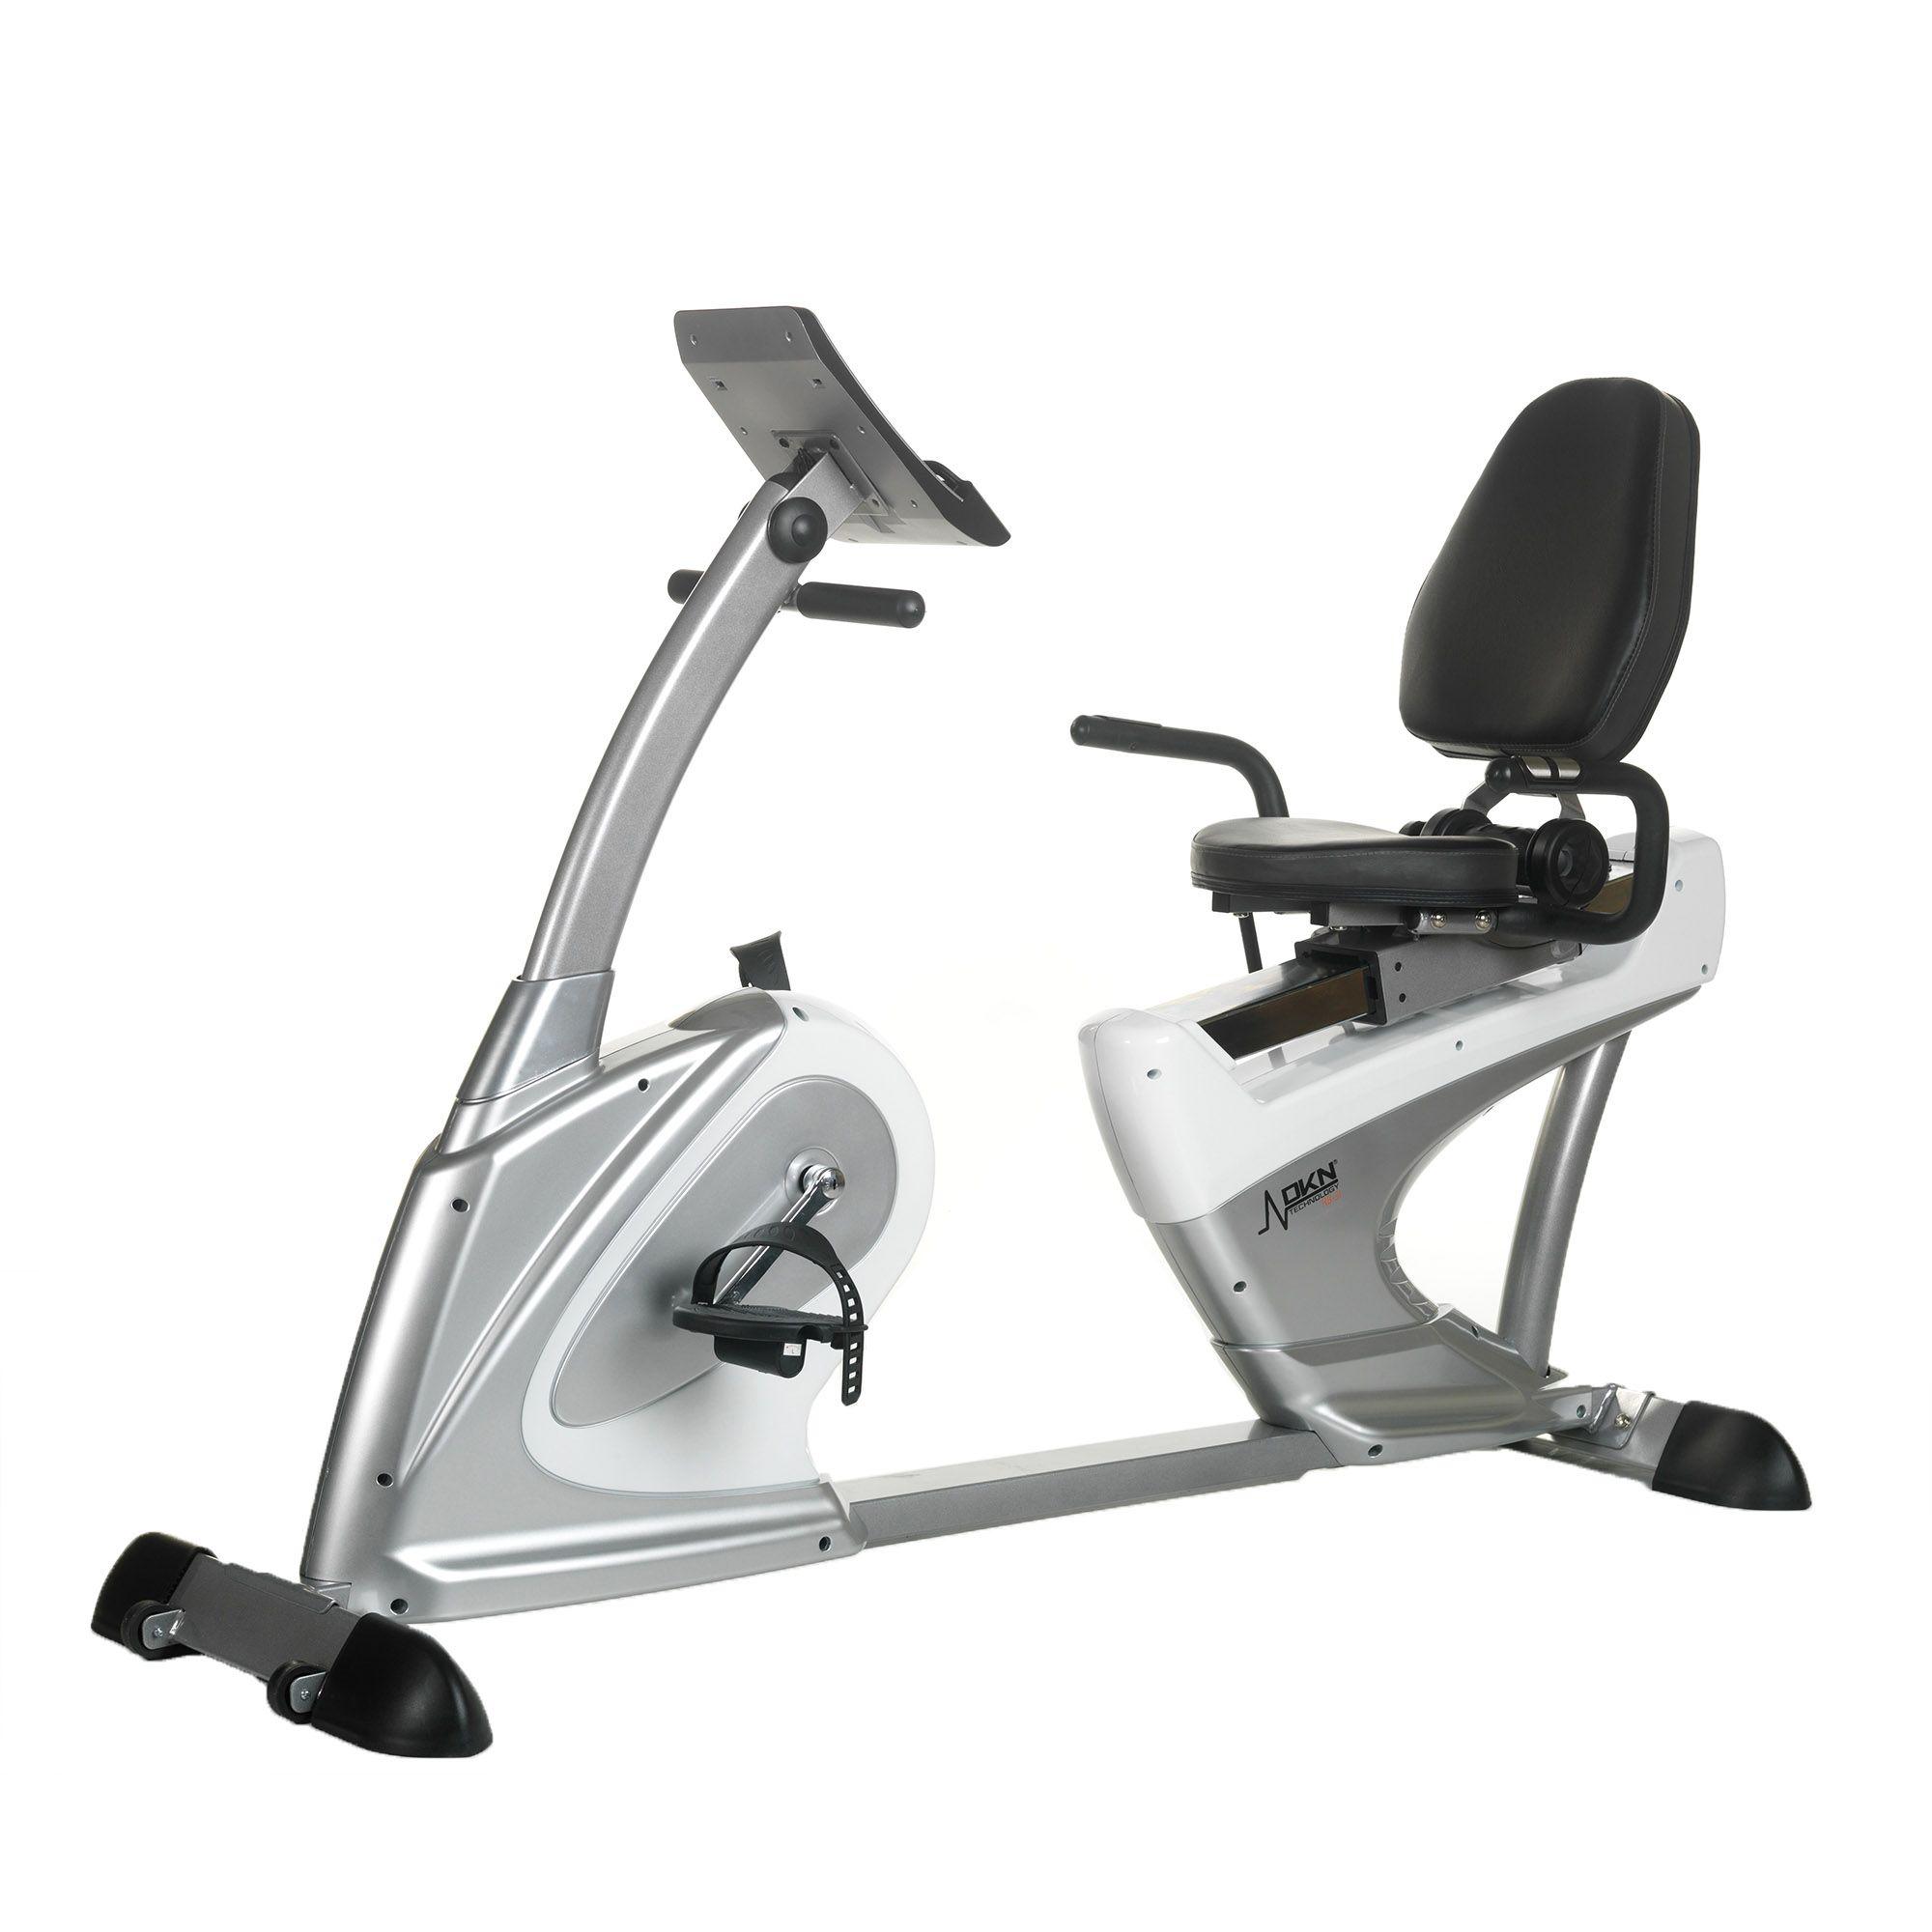 DKN RB-3i Recumbent Exercise Bike